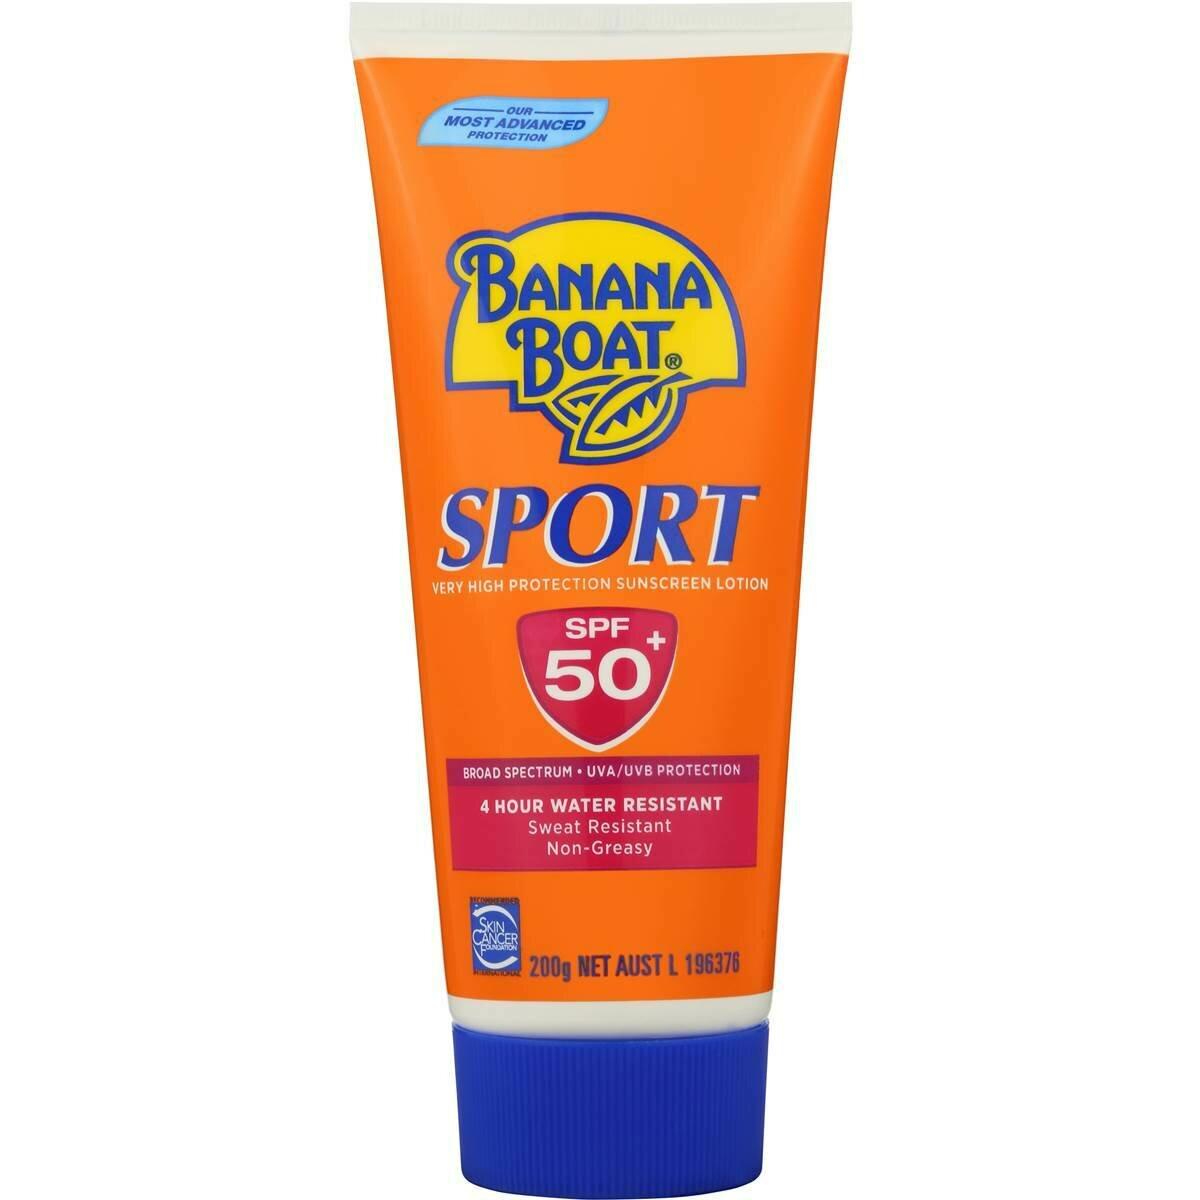 Banana Boat SPF 50+ 200g